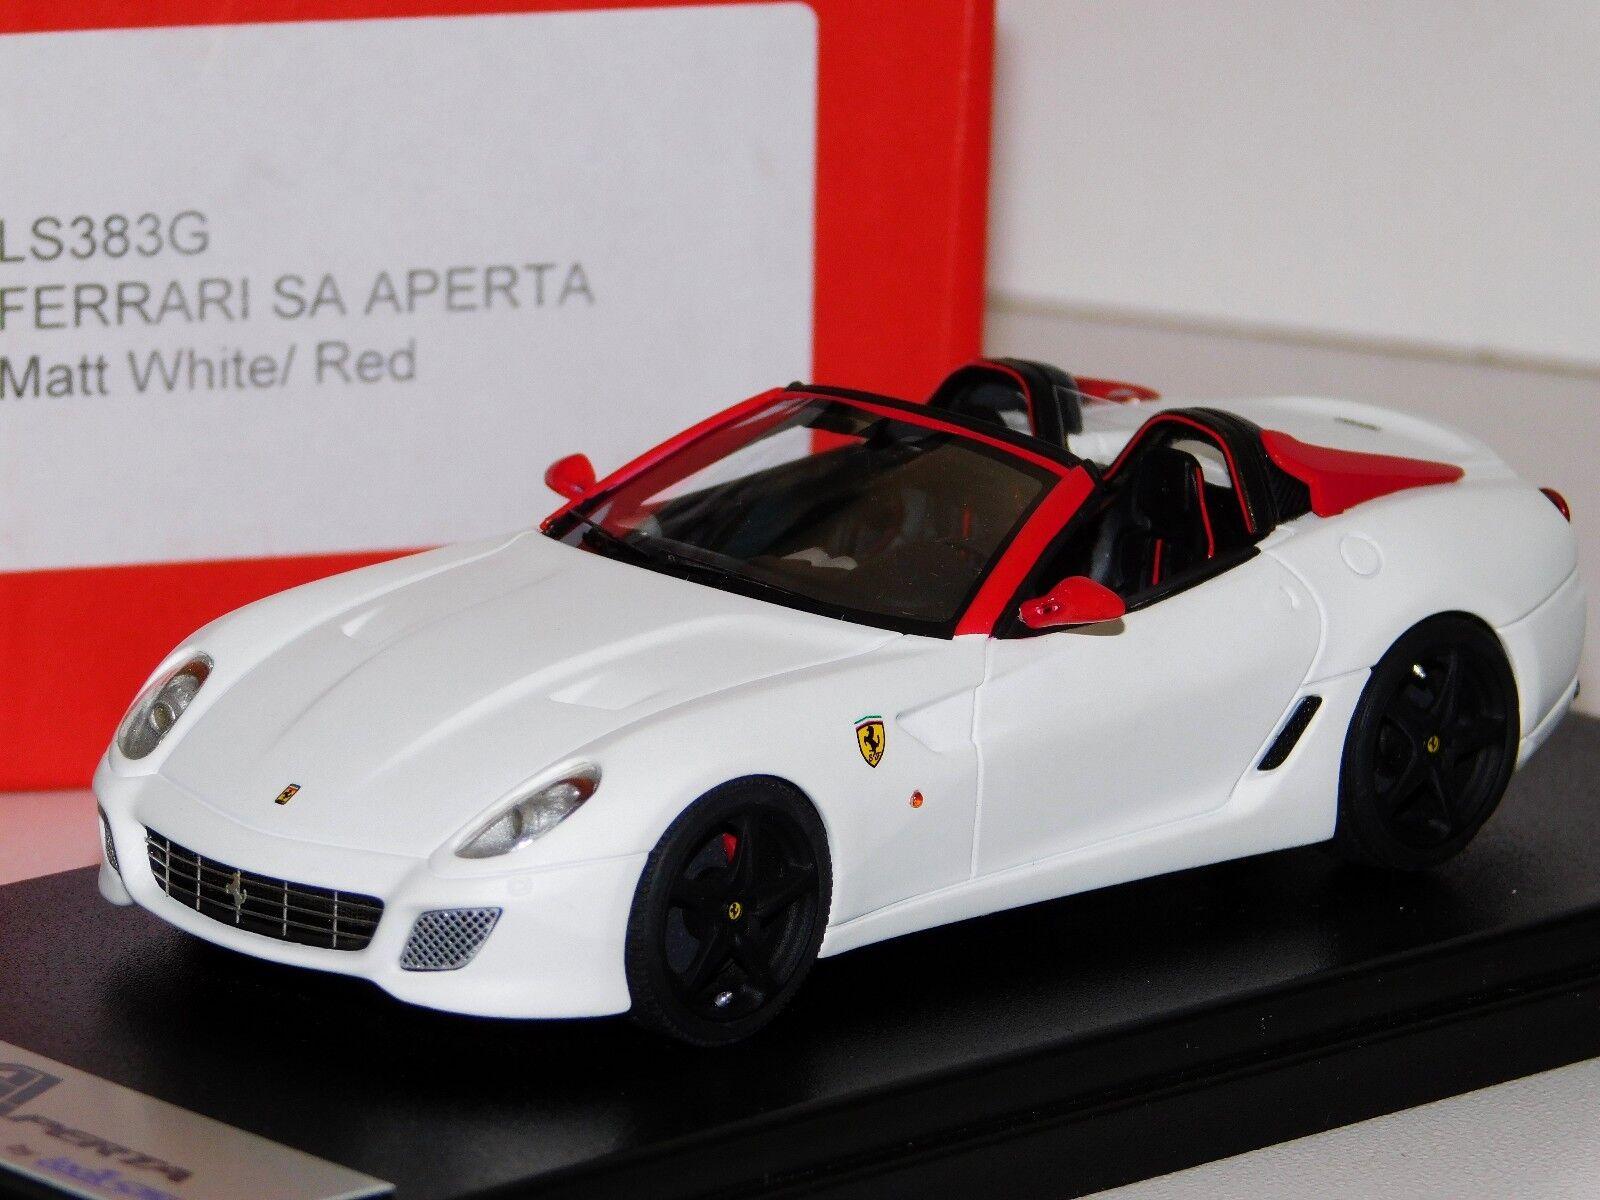 Ferrari SA Aperta Matt blanc rouge Looksmart LS383G engourdie 20 Lim 1 50 1 43